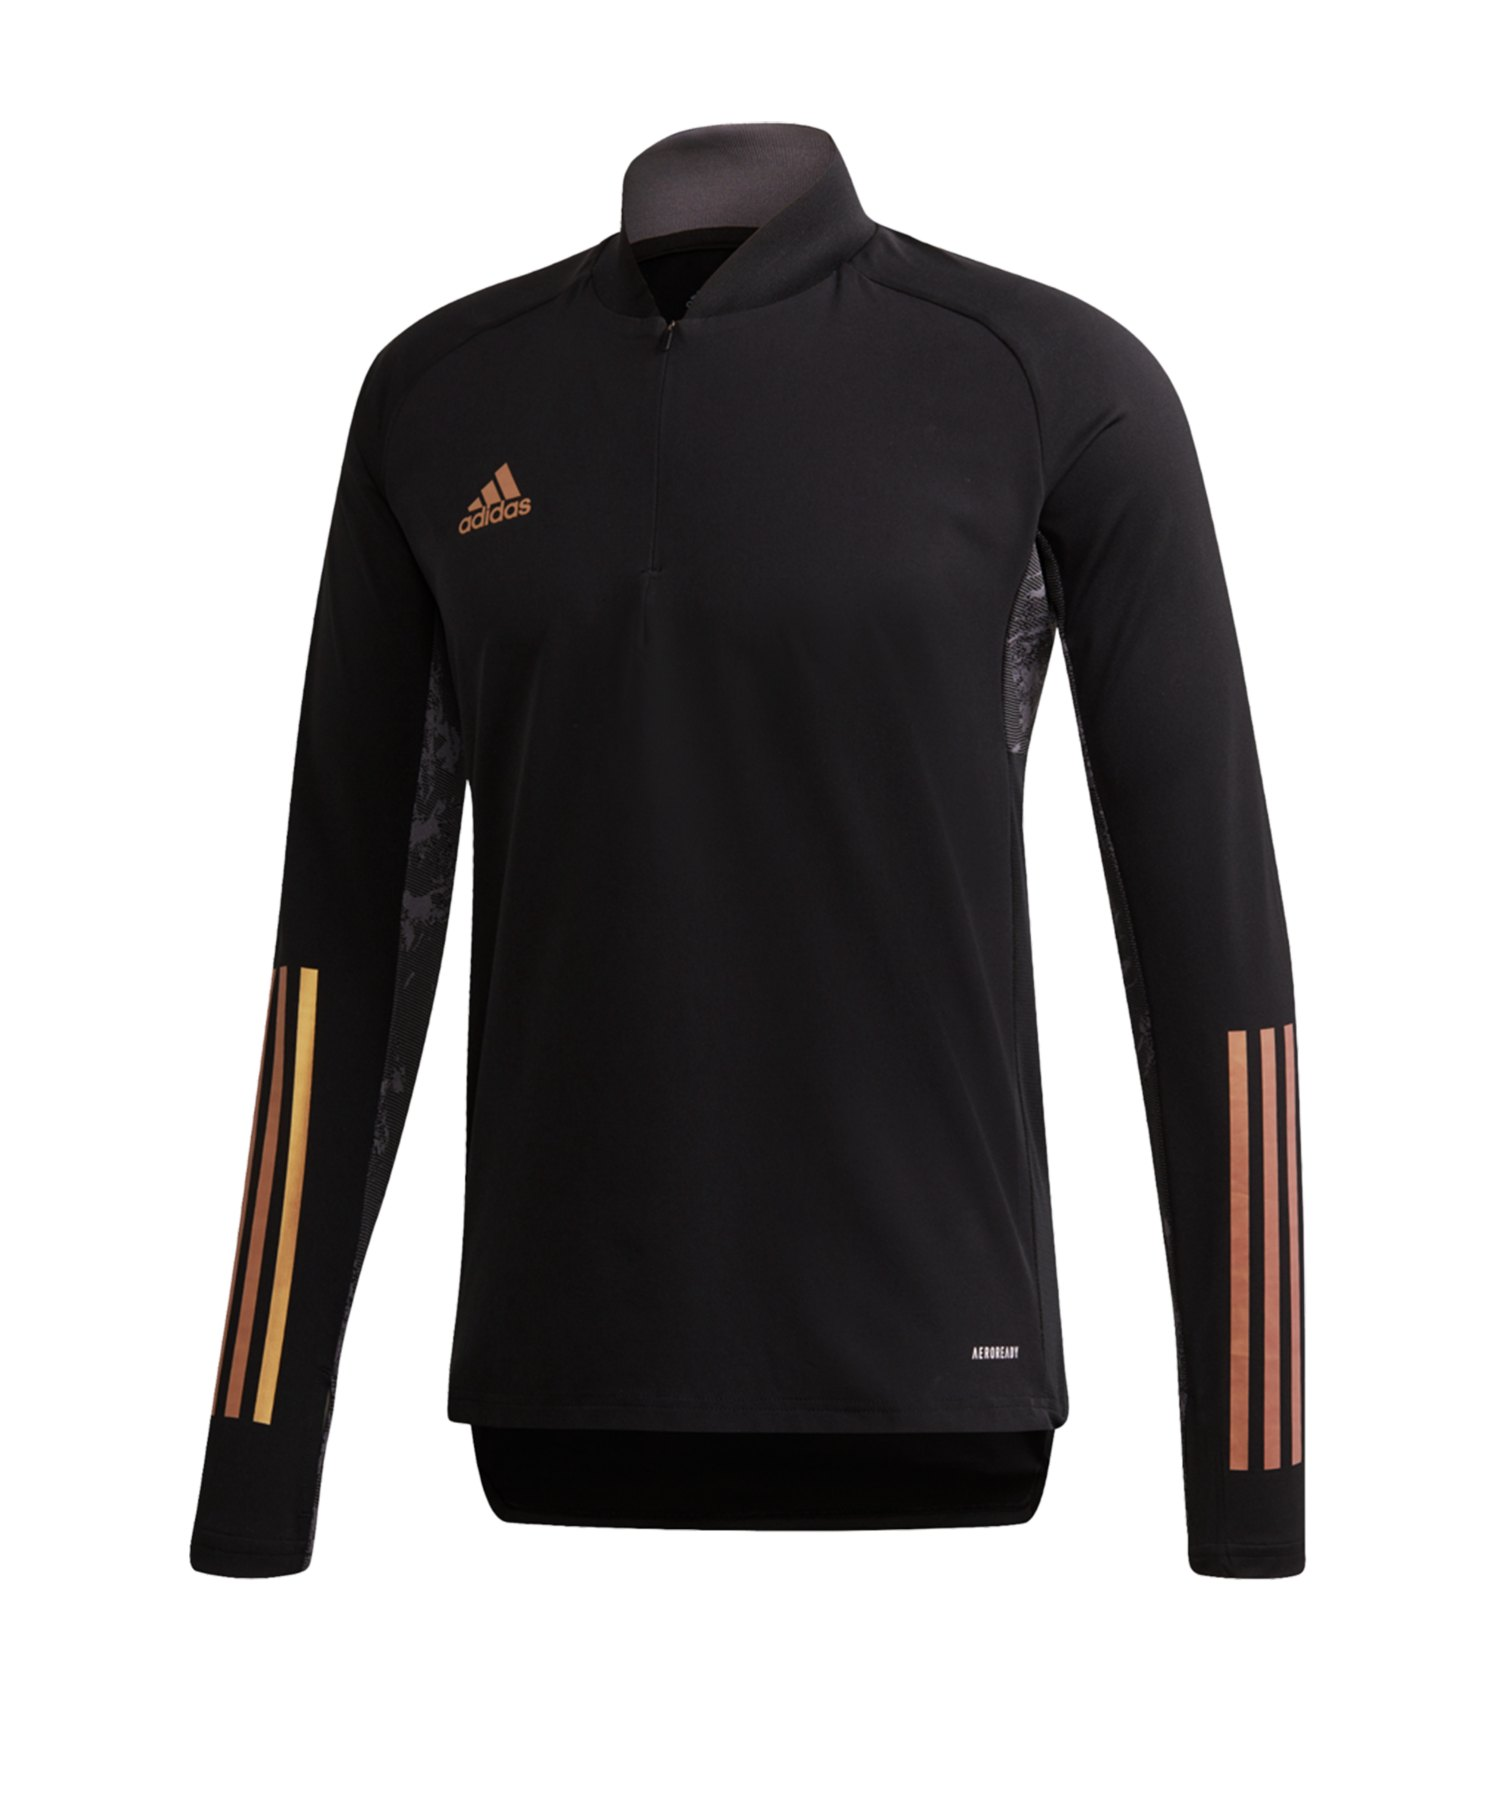 adidas Condivo 20 Ultaining Shirt langarm Schwarz - schwarz